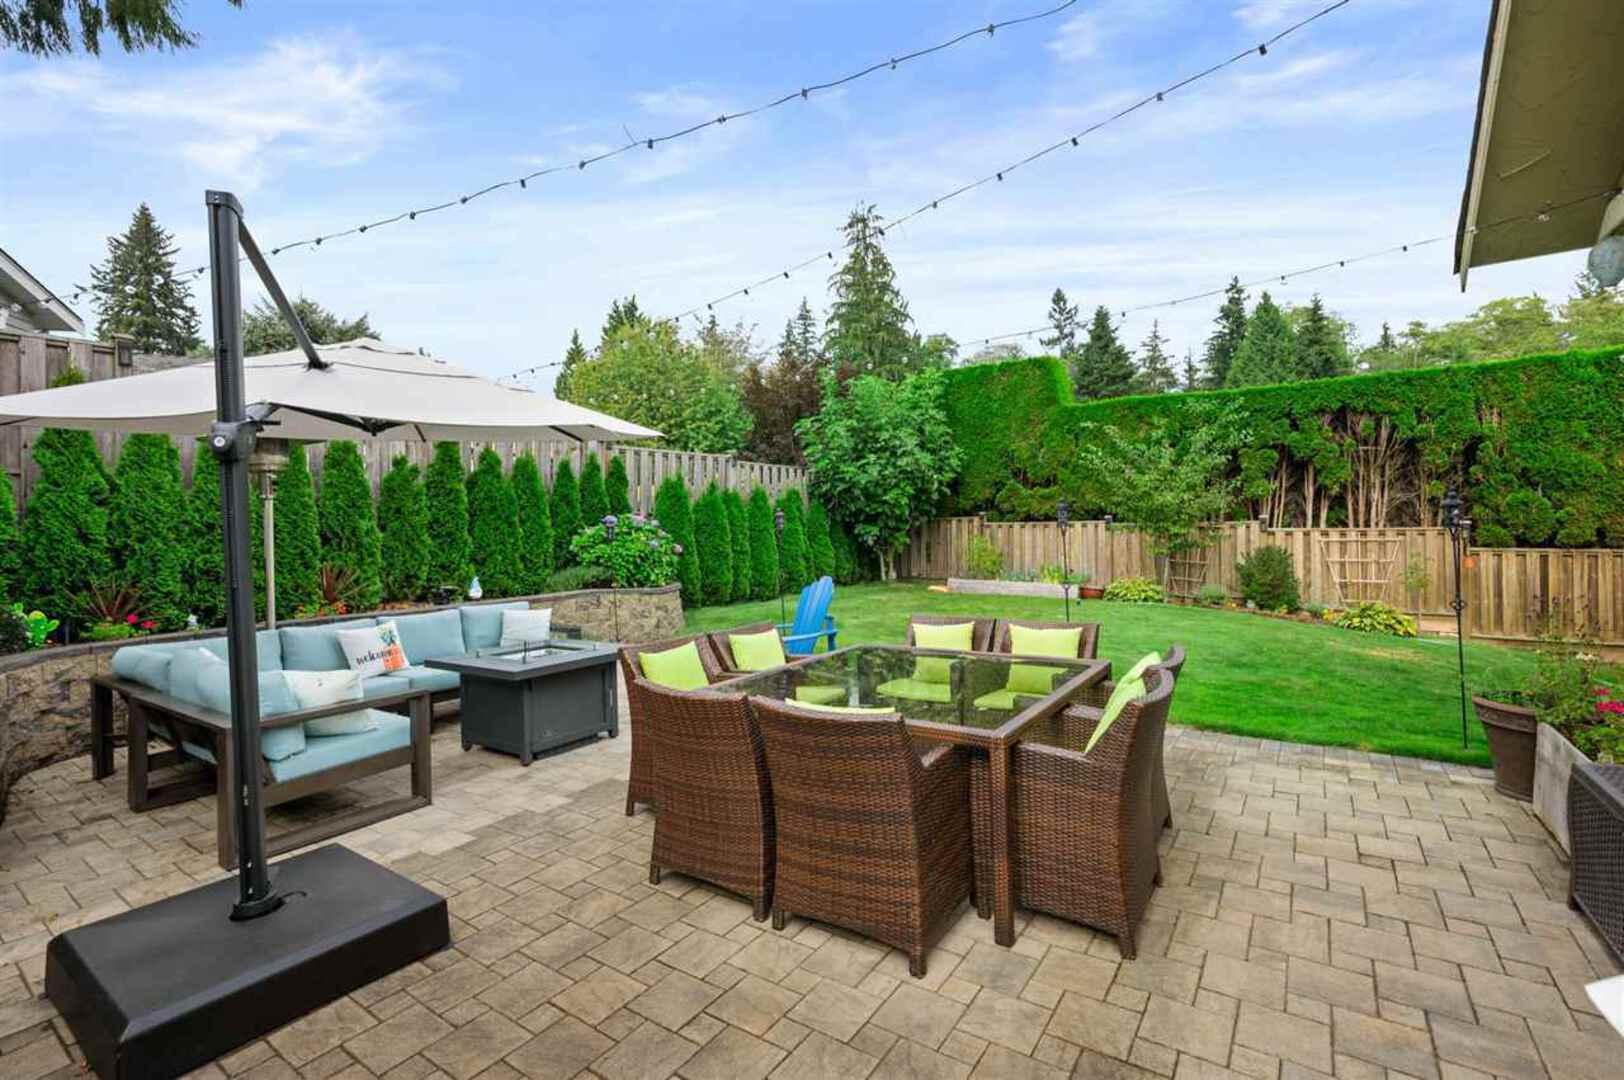 2808-trillium-place-blueridge-nv-north-vancouver-35 at 2808 Trillium Place, Blueridge NV, North Vancouver